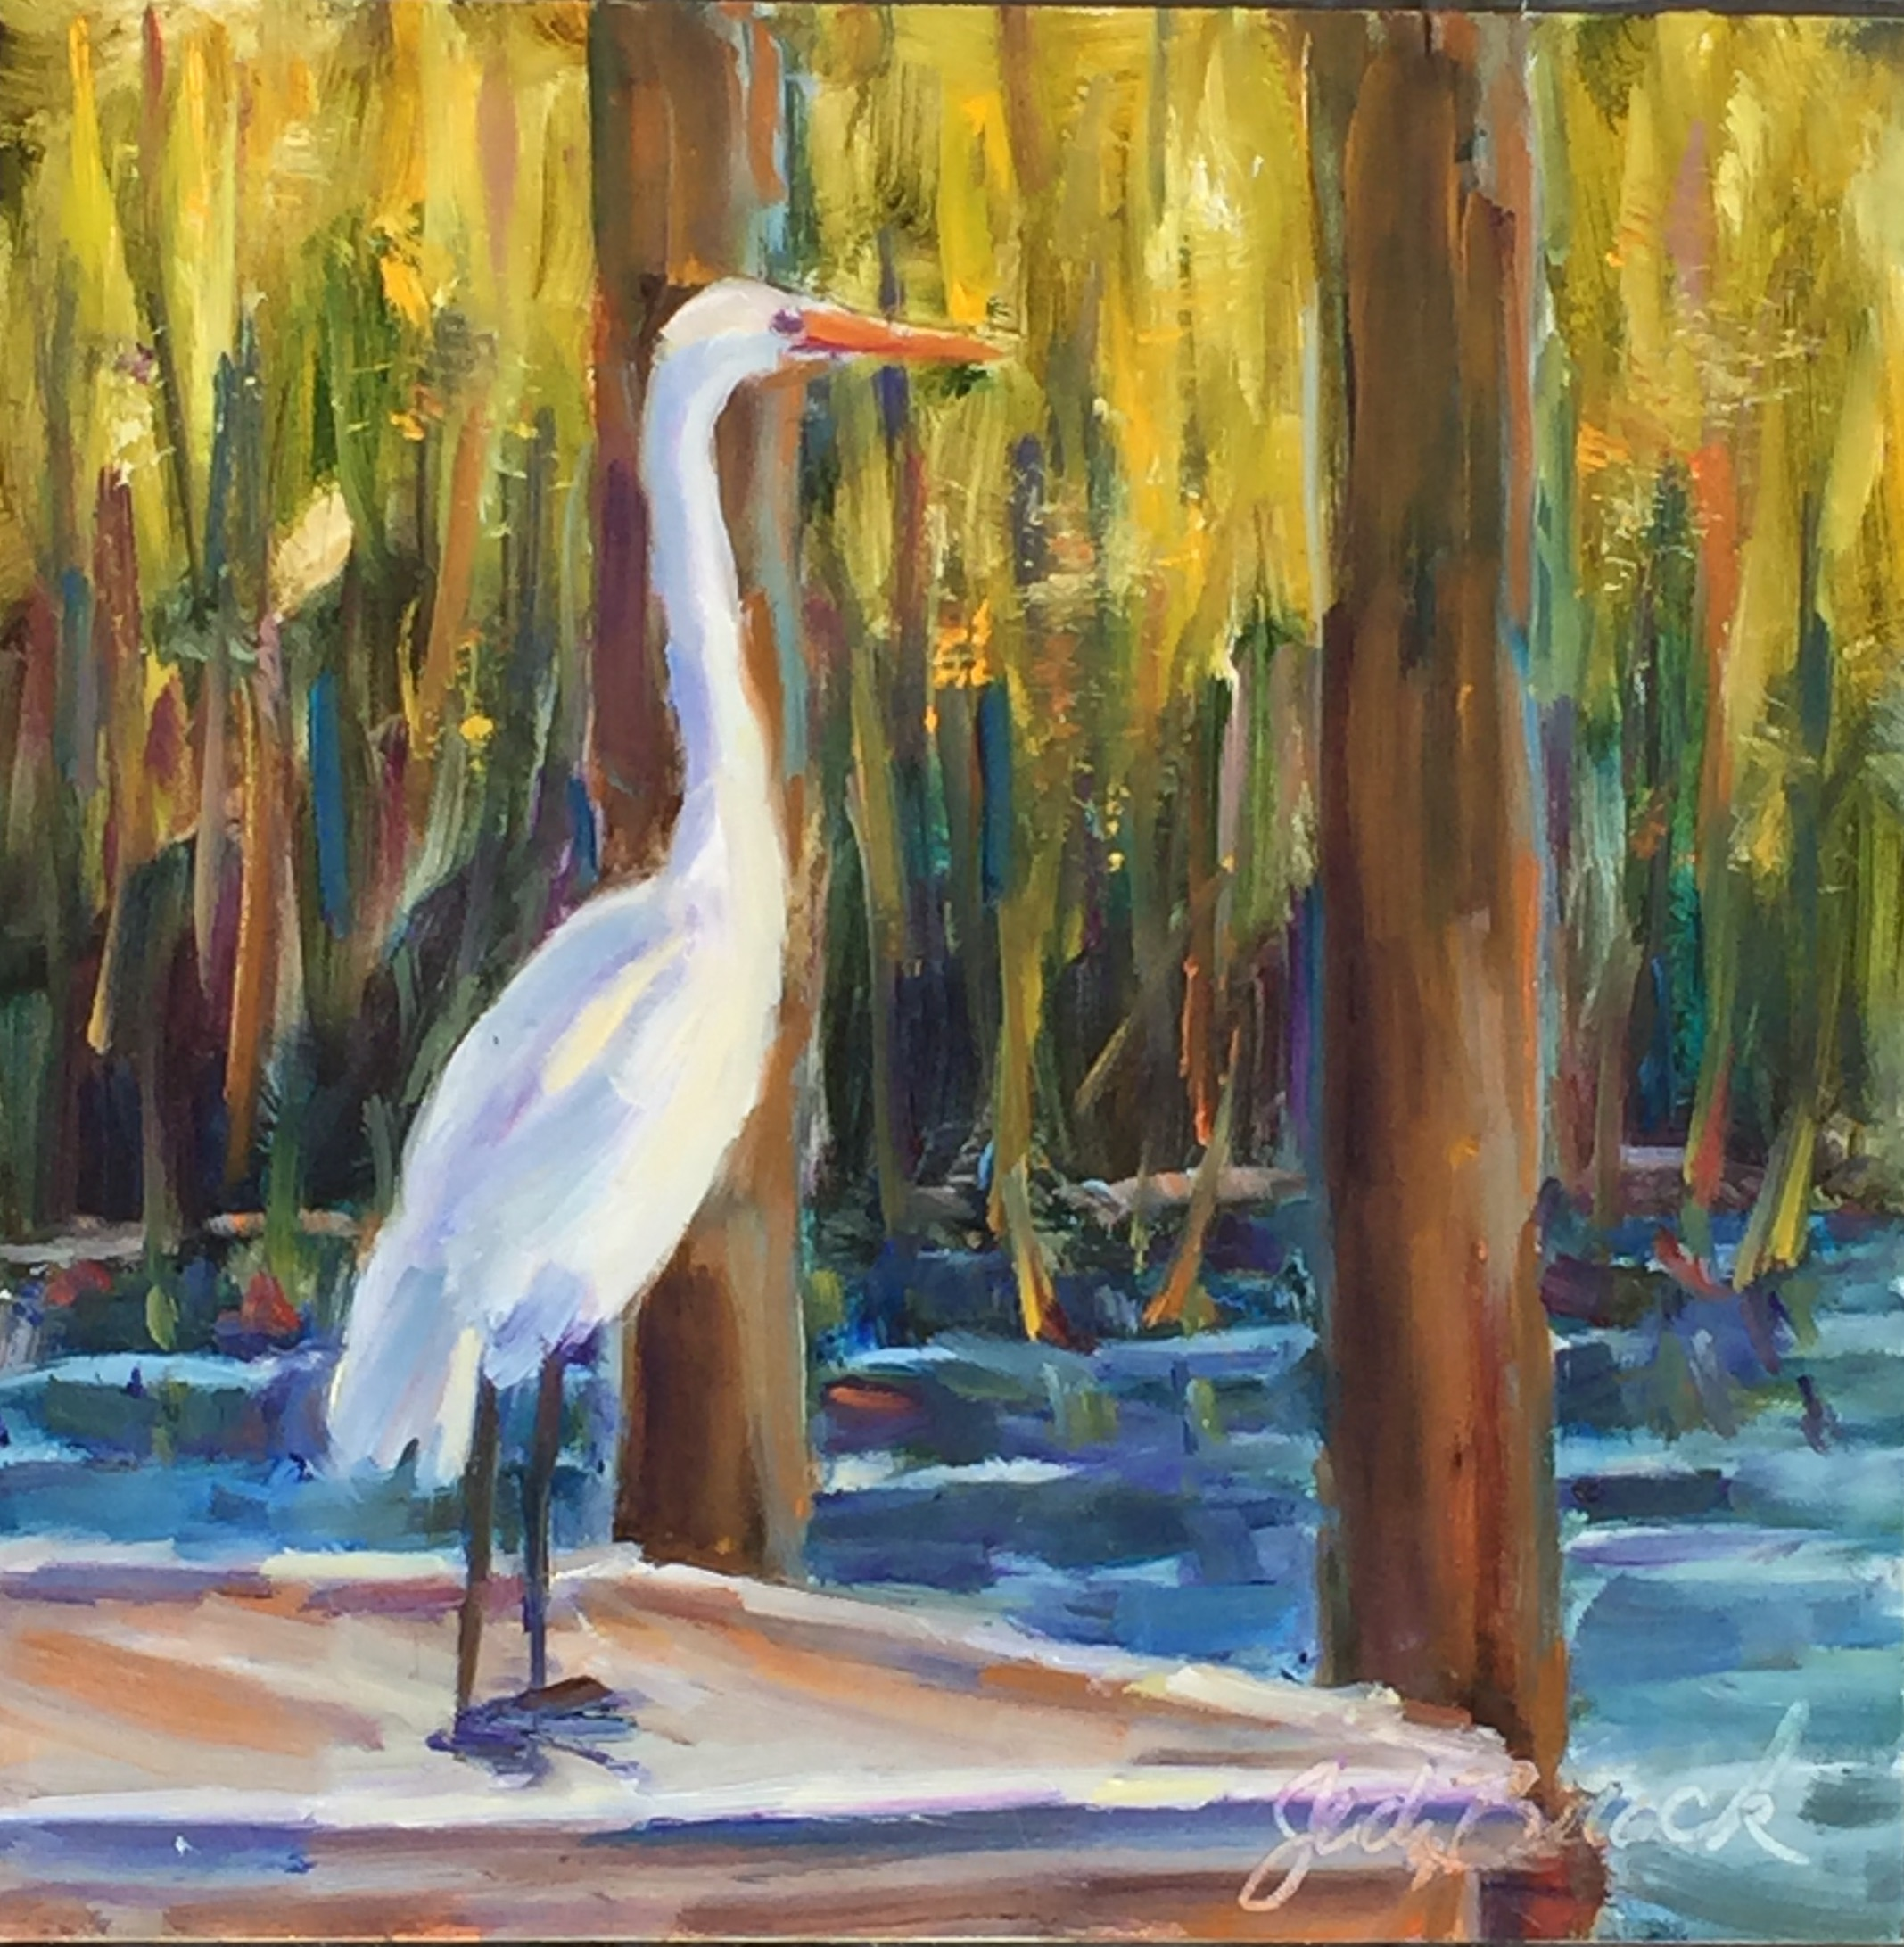 Egret on the Dock